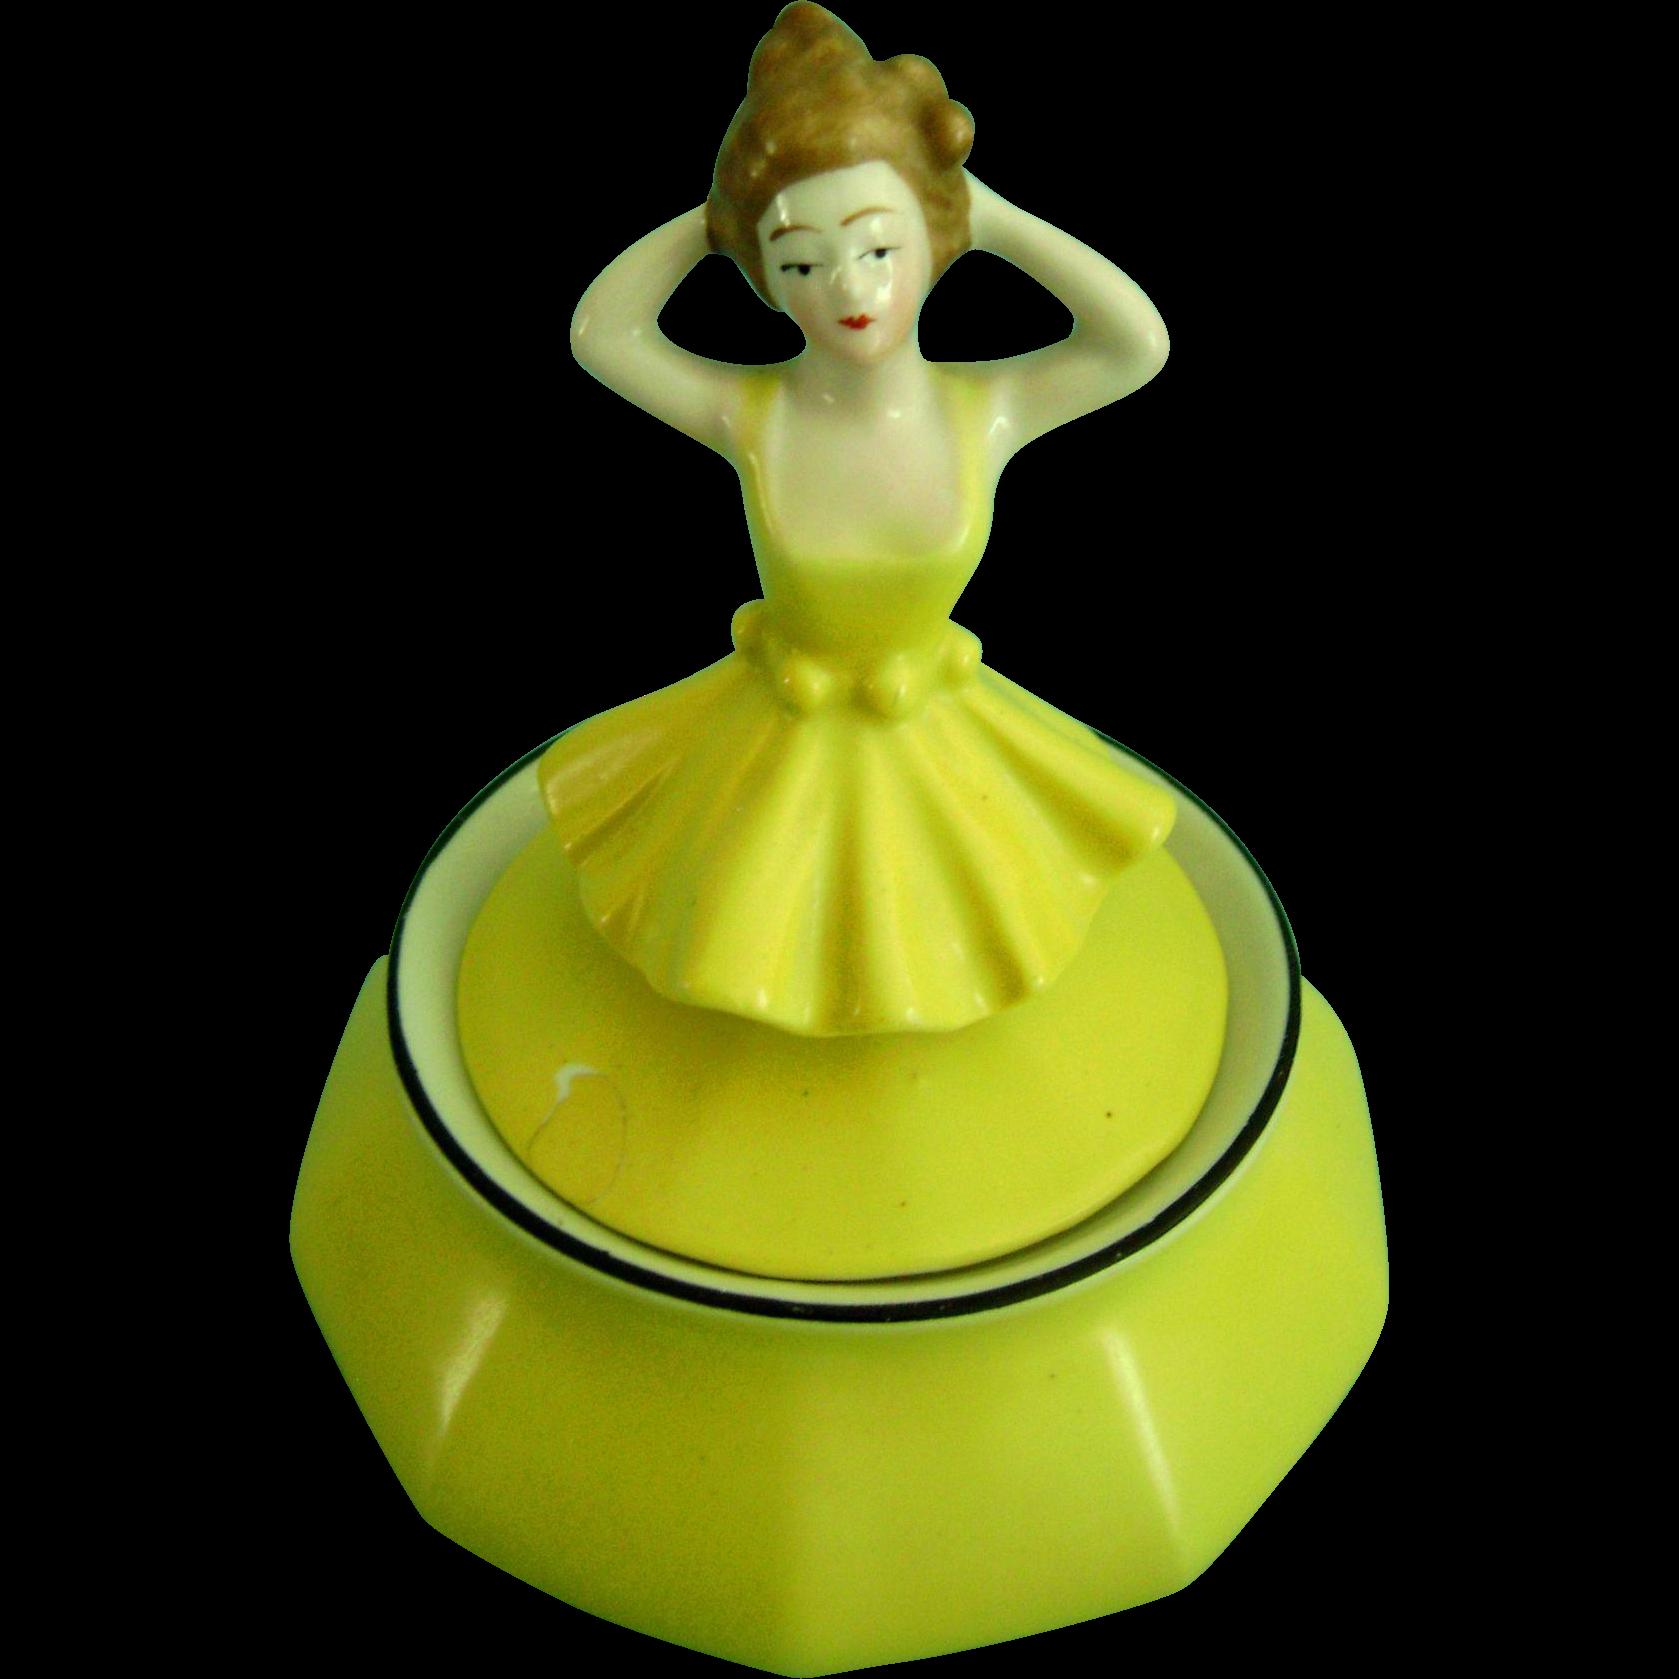 Vintage Antique Half Doll Pin Cushion Related Porcelain Powder Jar Bottle German